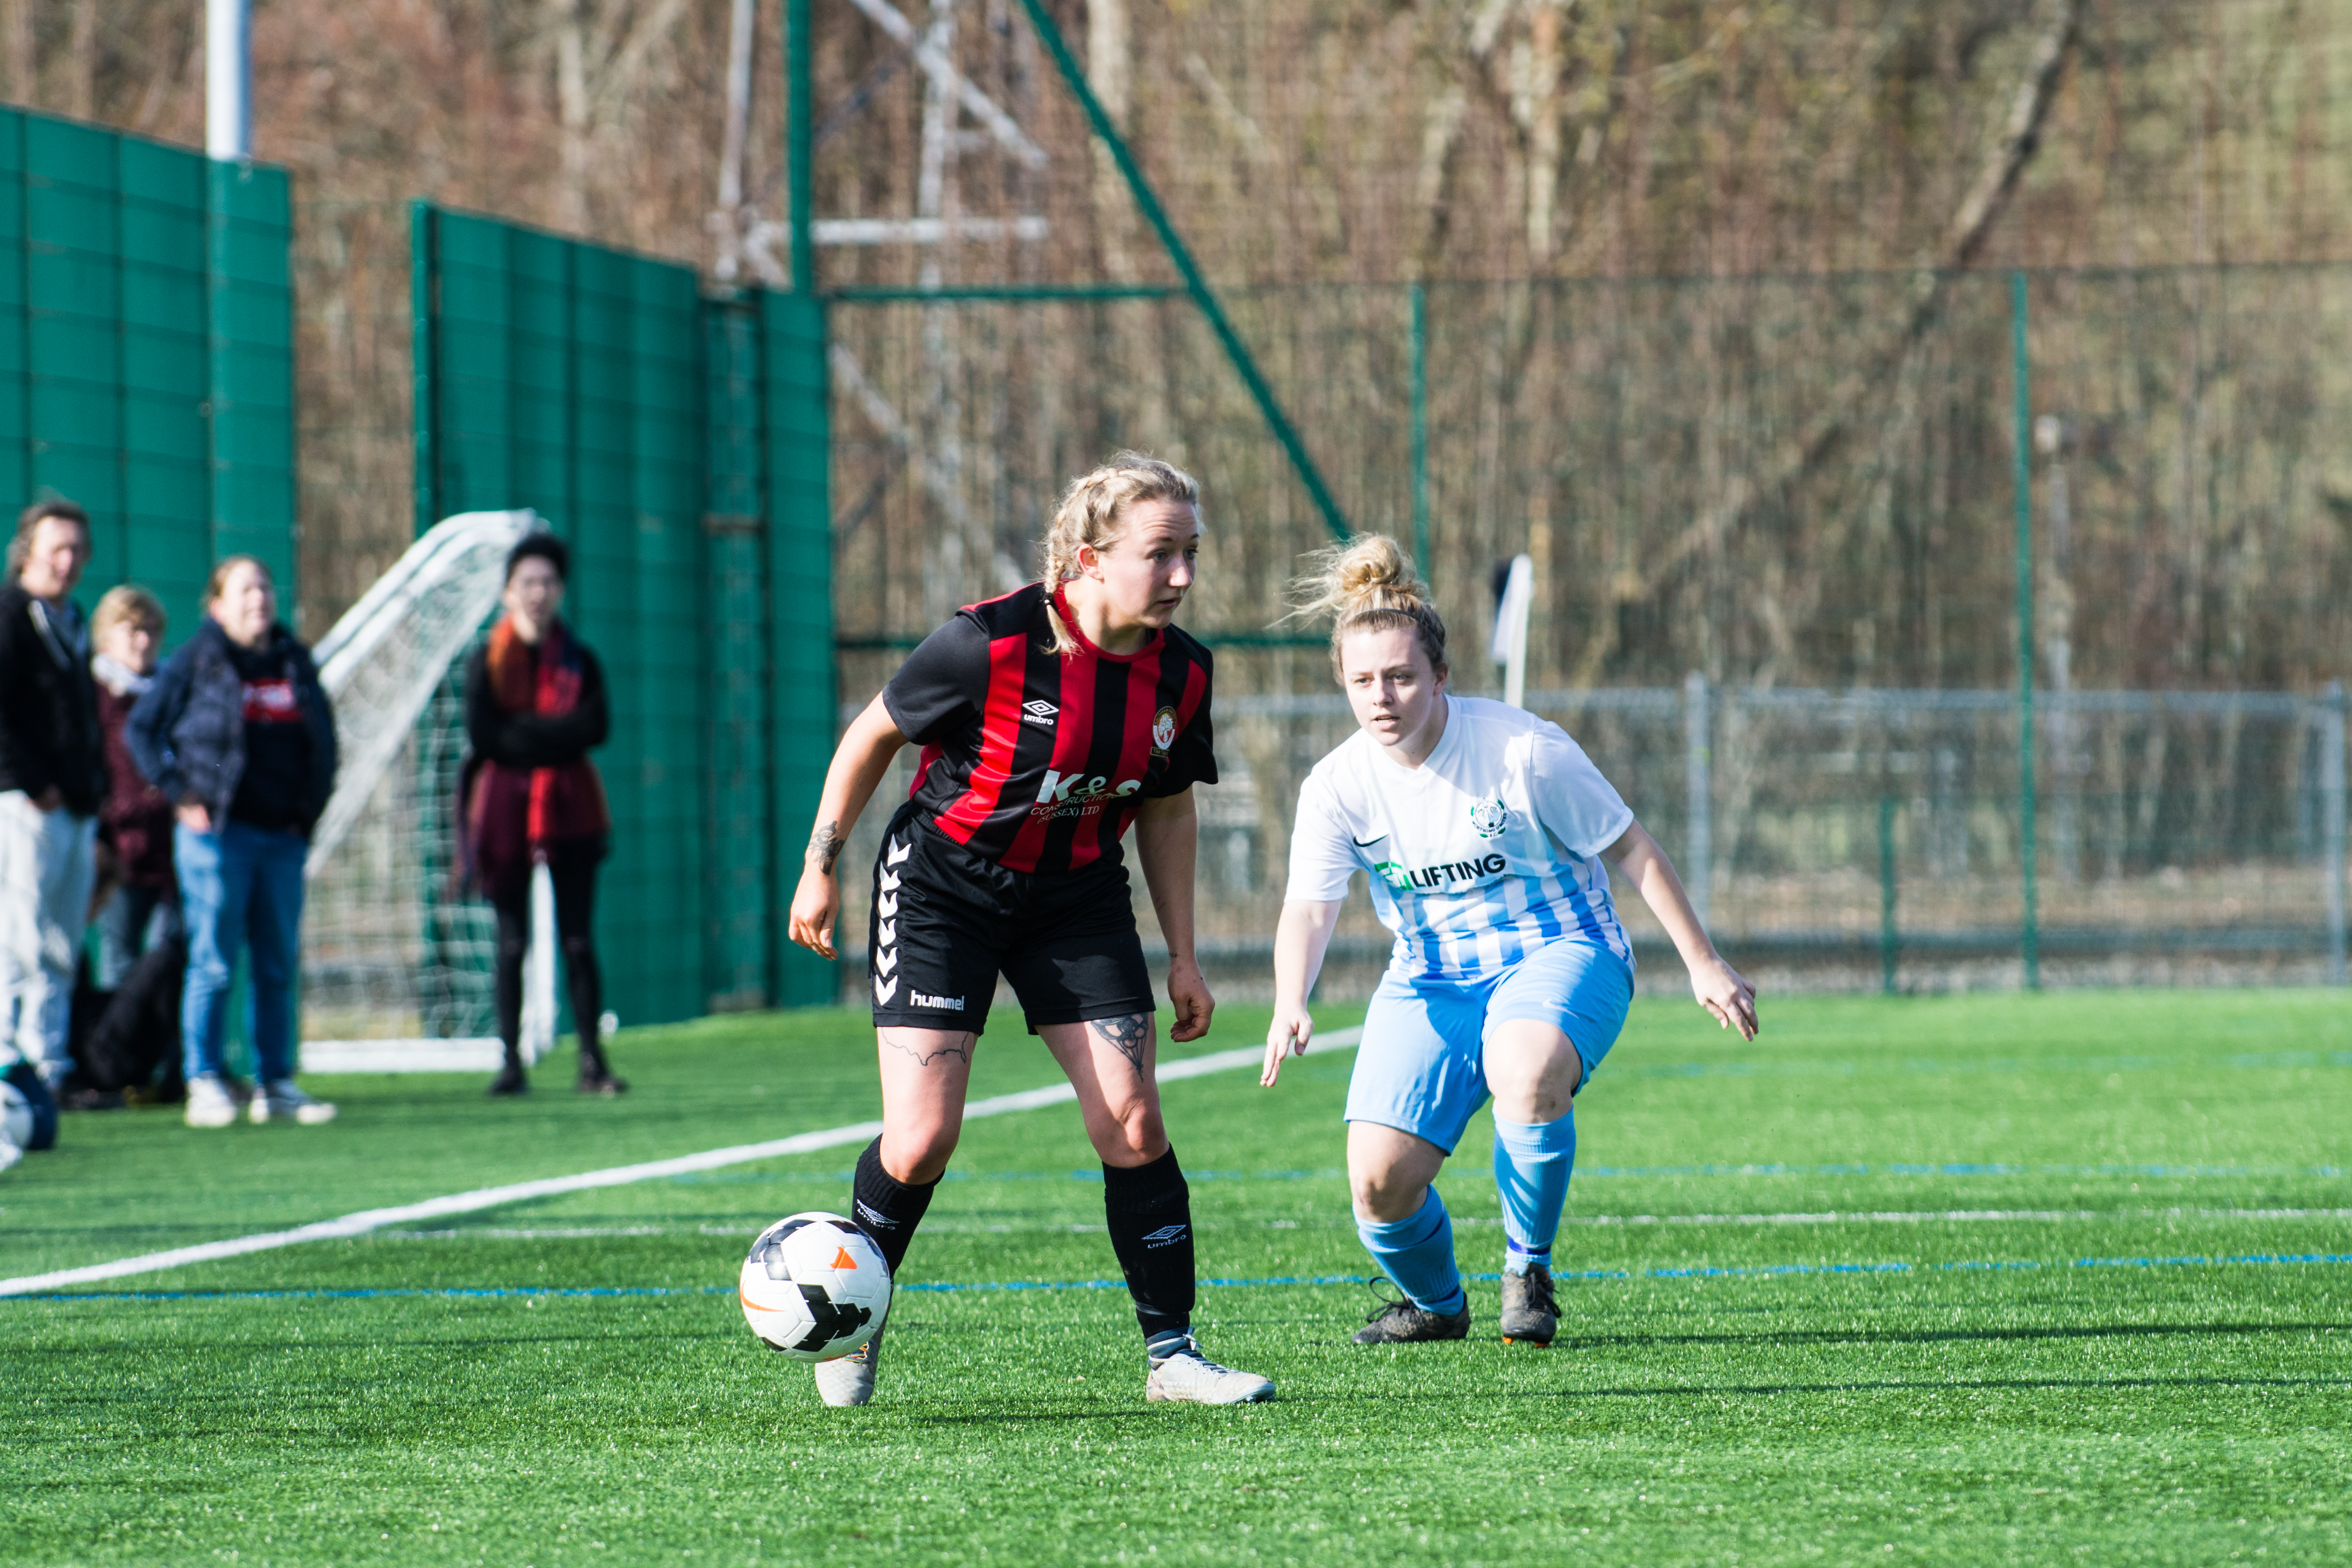 DAVID_JEFFERY Saltdean Utd Ladies FC vs Worthing Utd Ladies FC 11.03.18 18